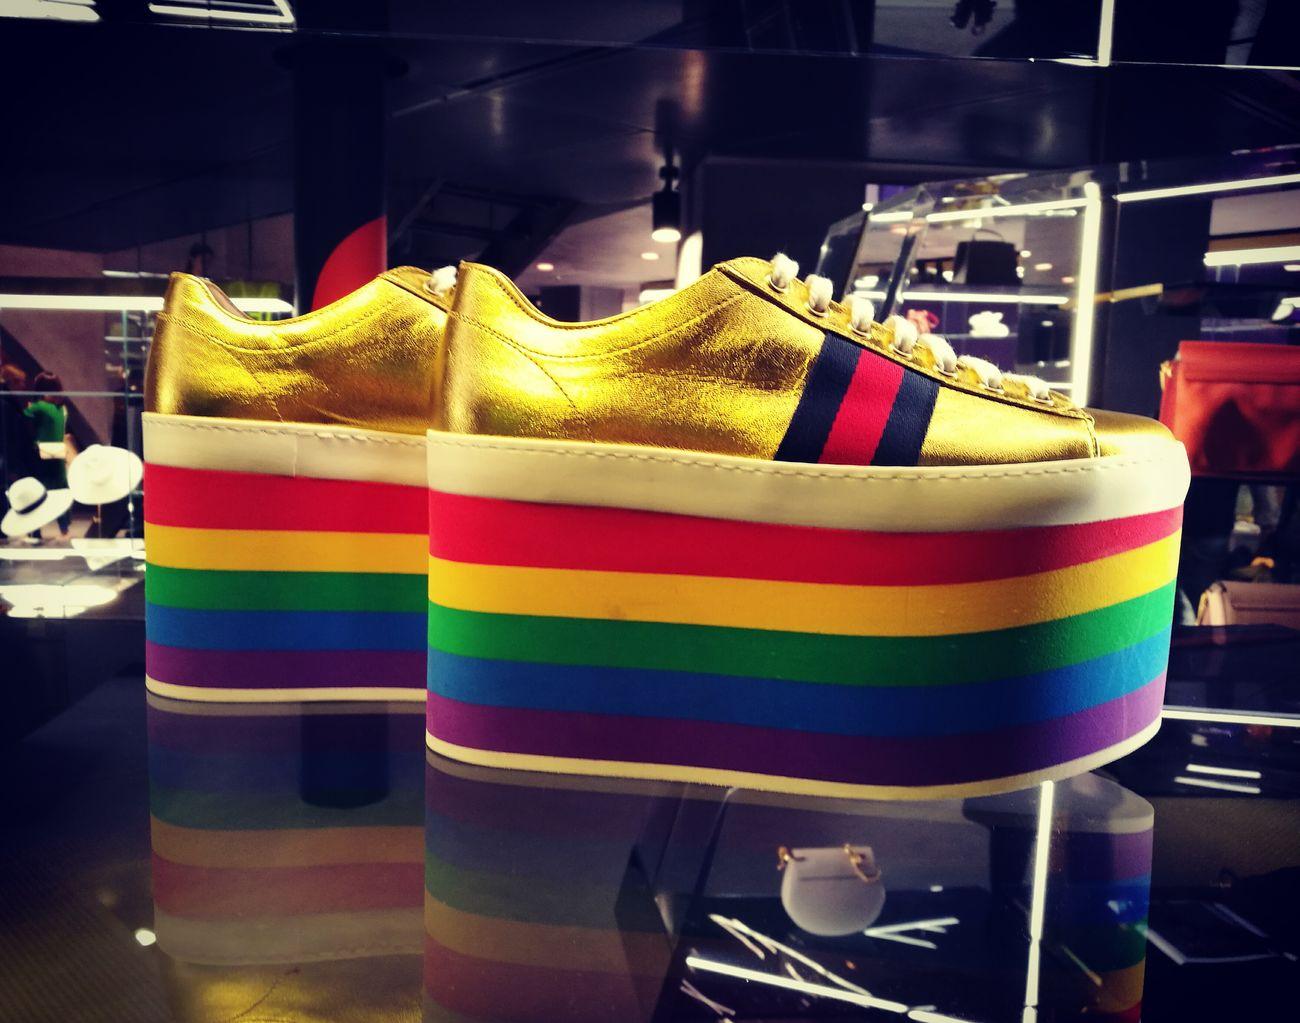 Rainbow Rainbow Colors Bowbow GUCCI Shoes Fantasy Unicorn